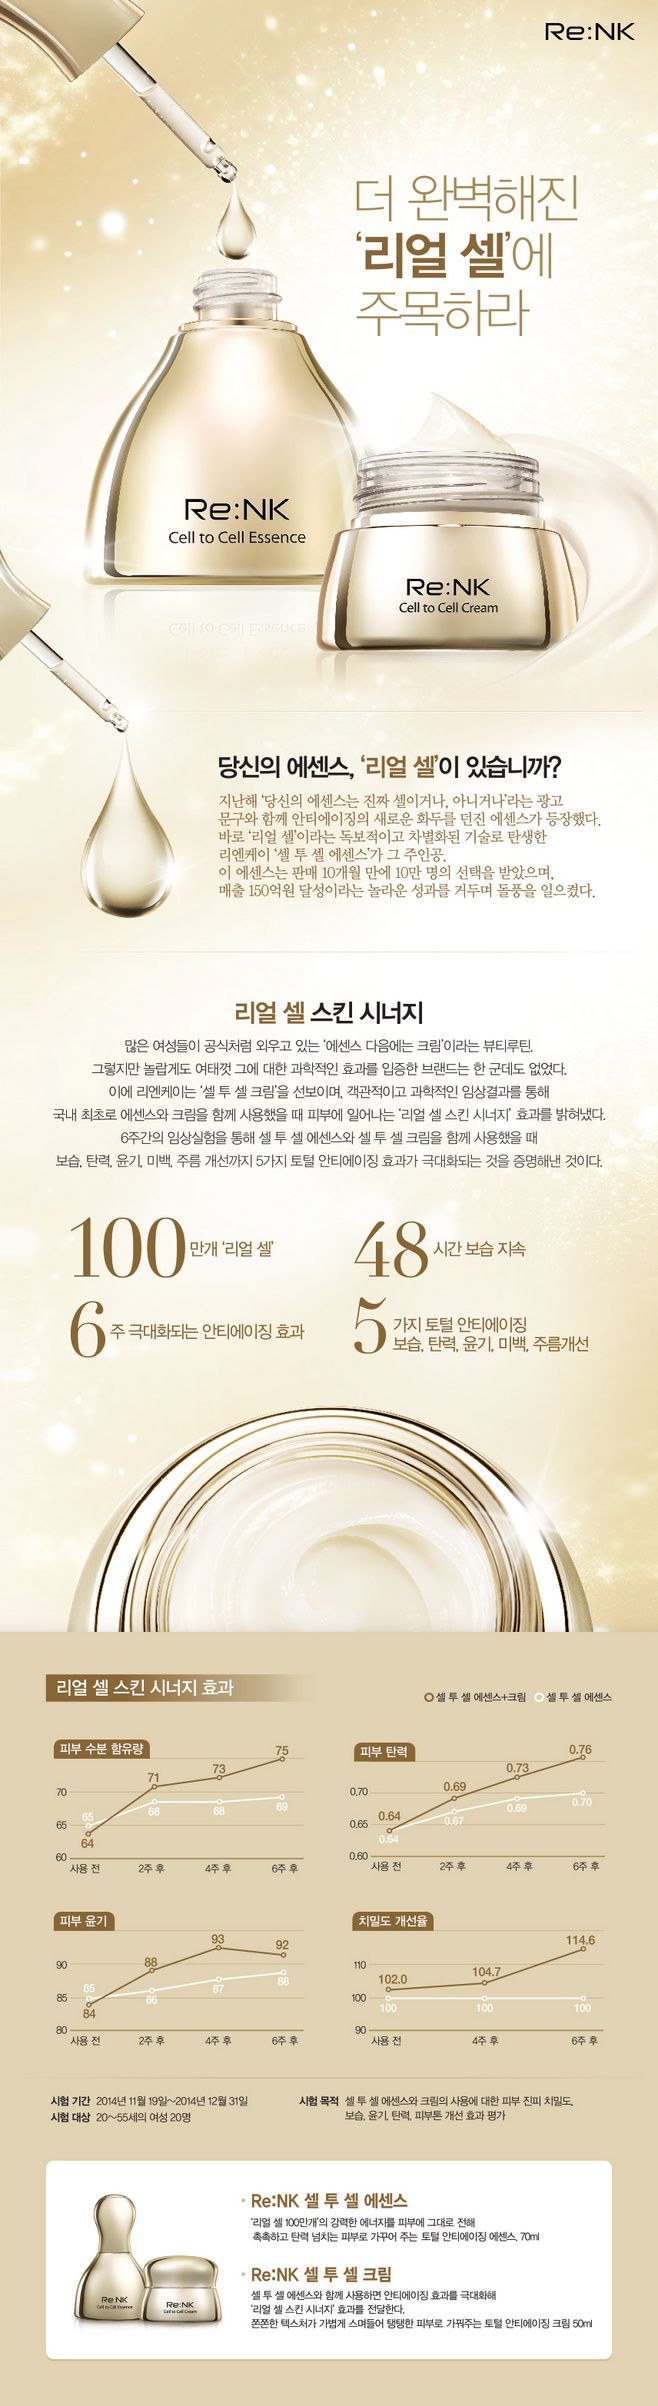 Yanlee采集到化妆品海报(236图)_花瓣平面